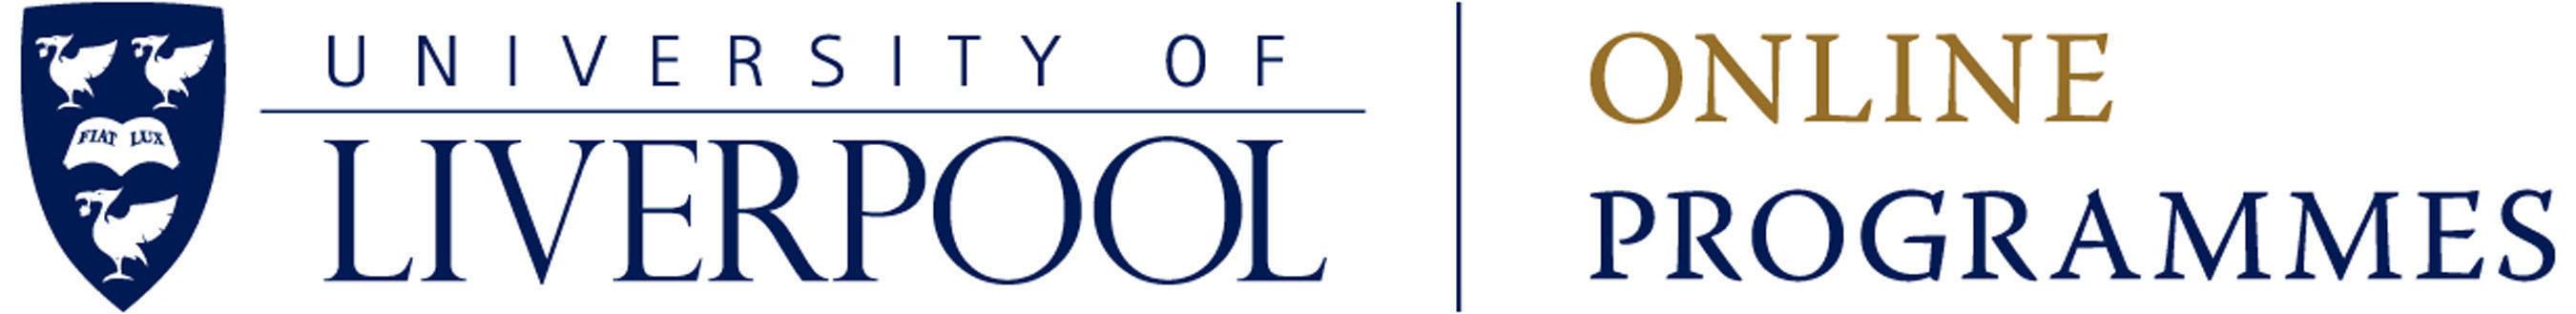 University of Liverpool Online Programmes